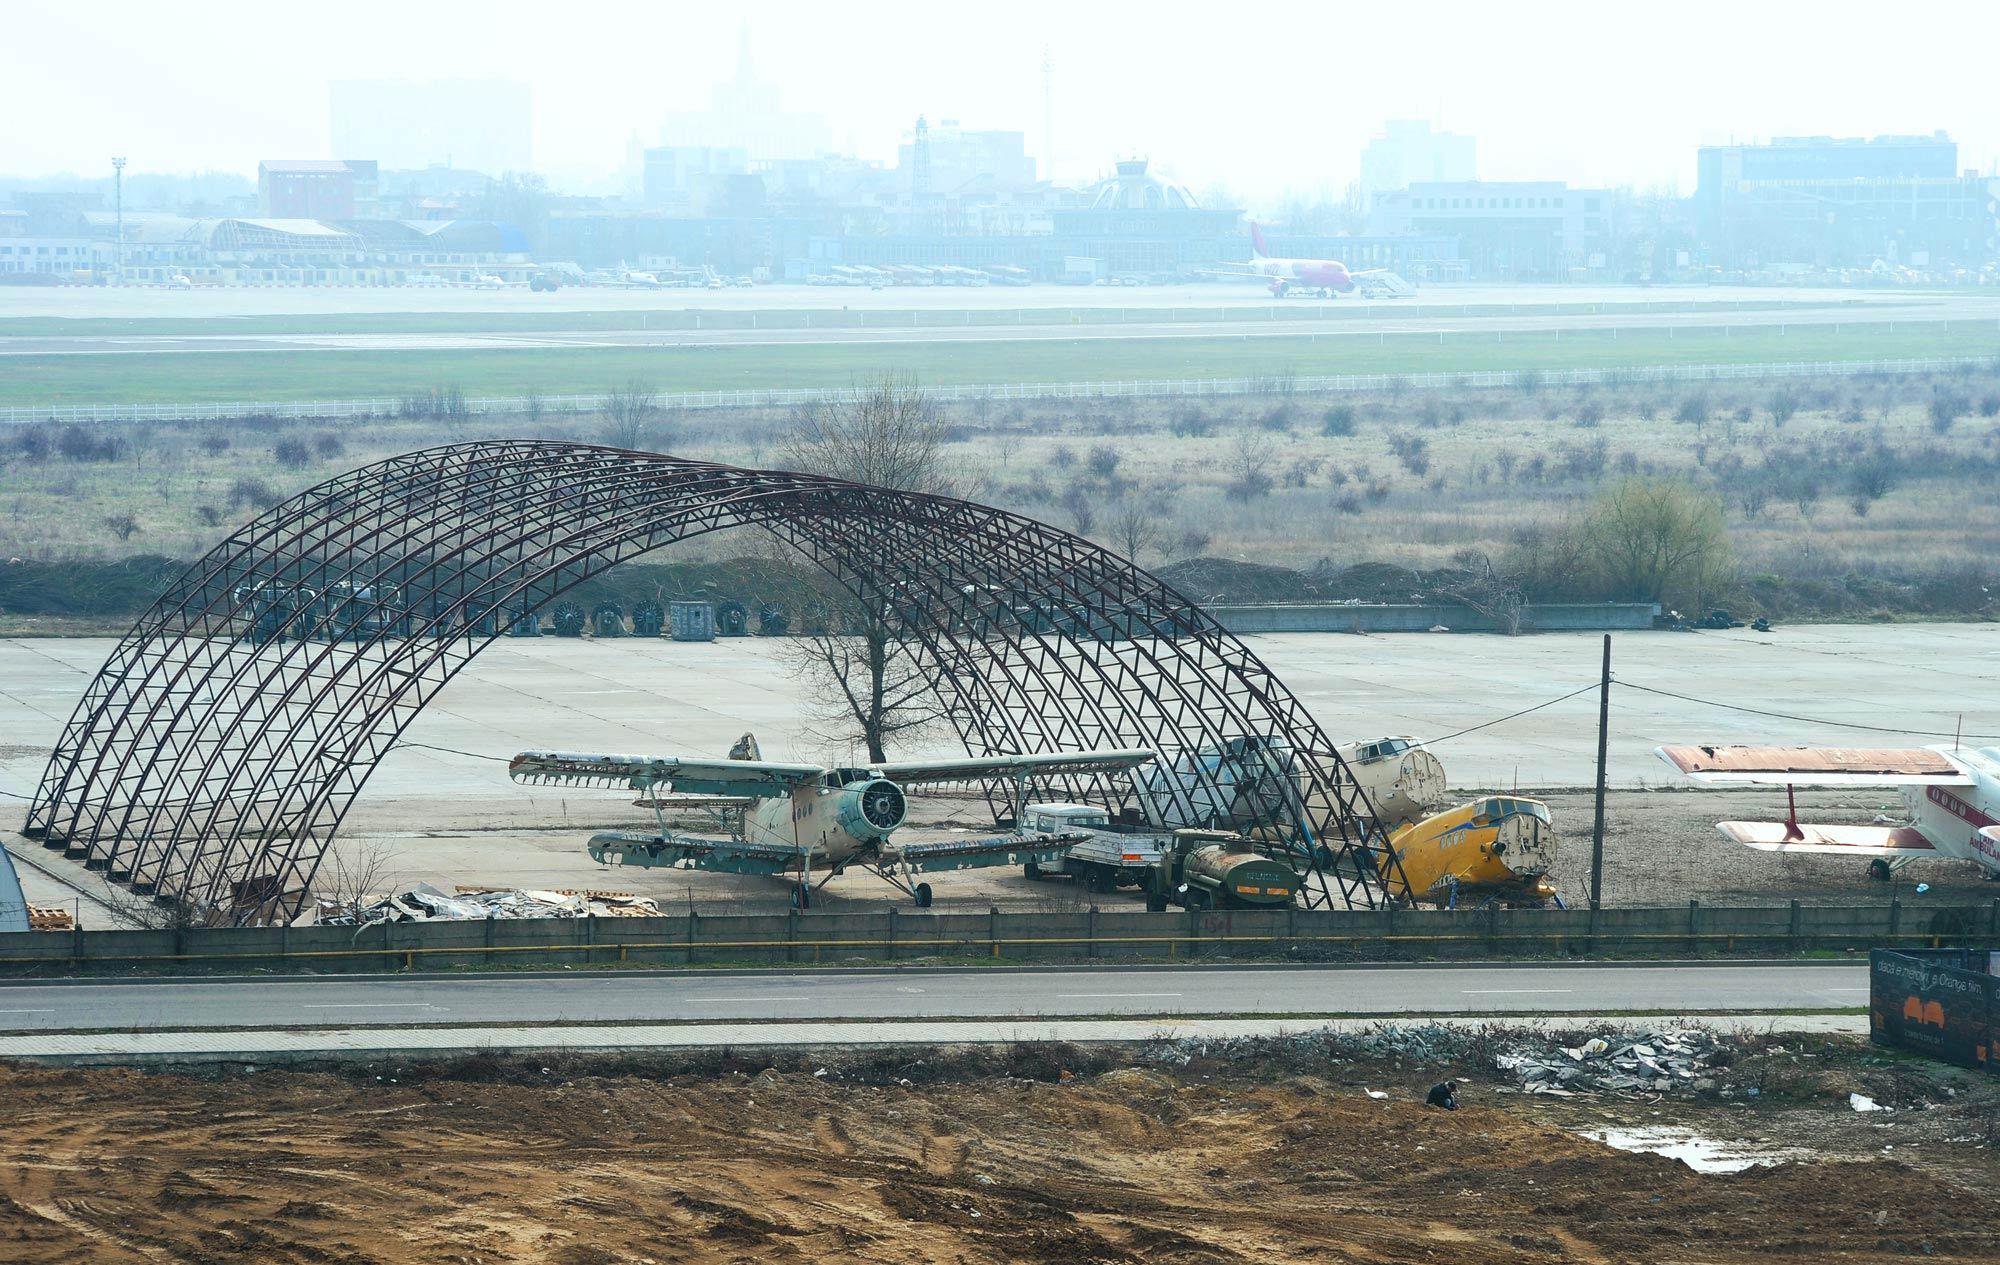 aircraft_boneyard_baneasa_romania